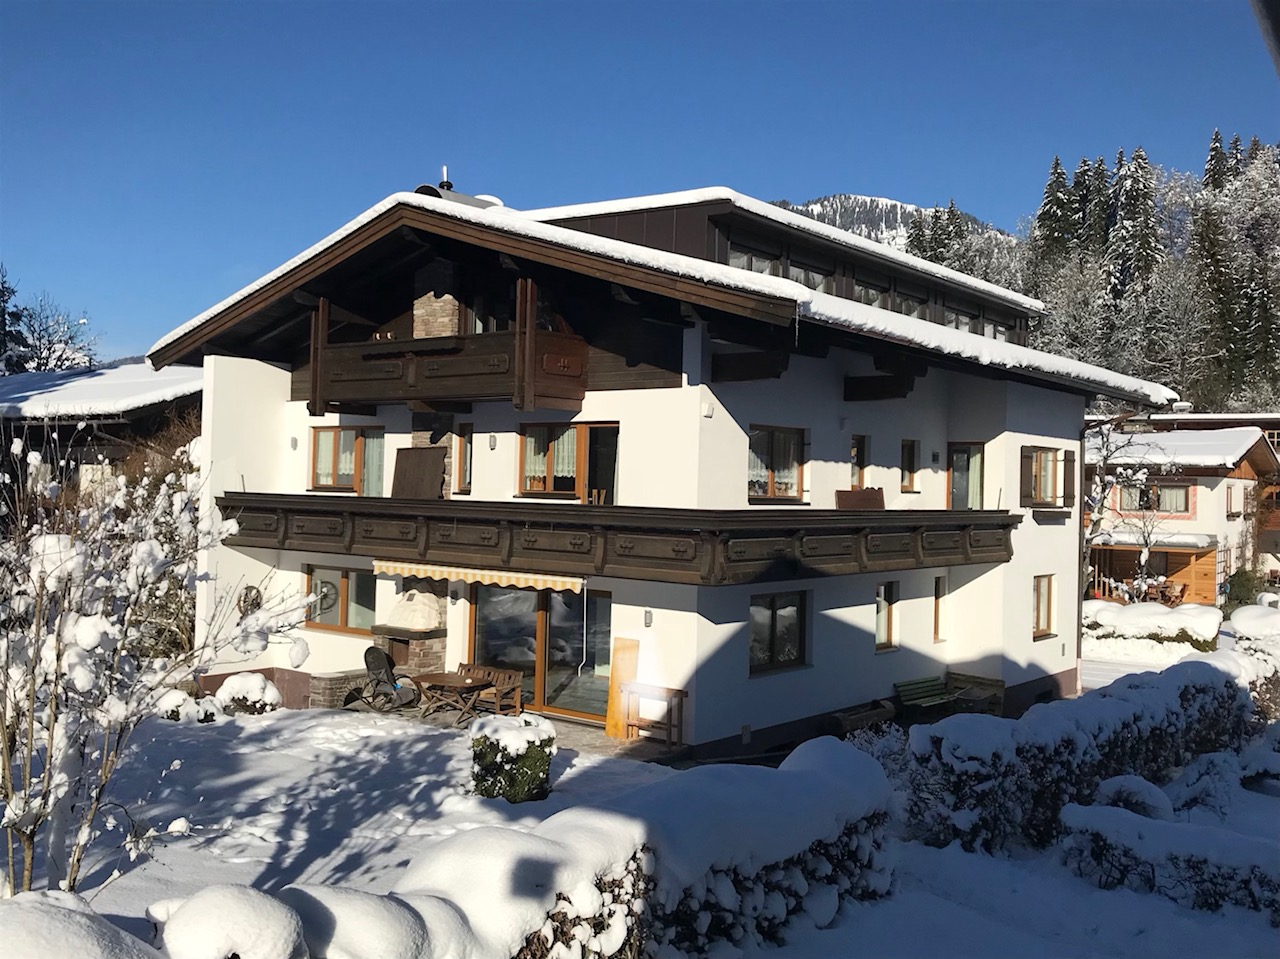 Haus Hinterholzer